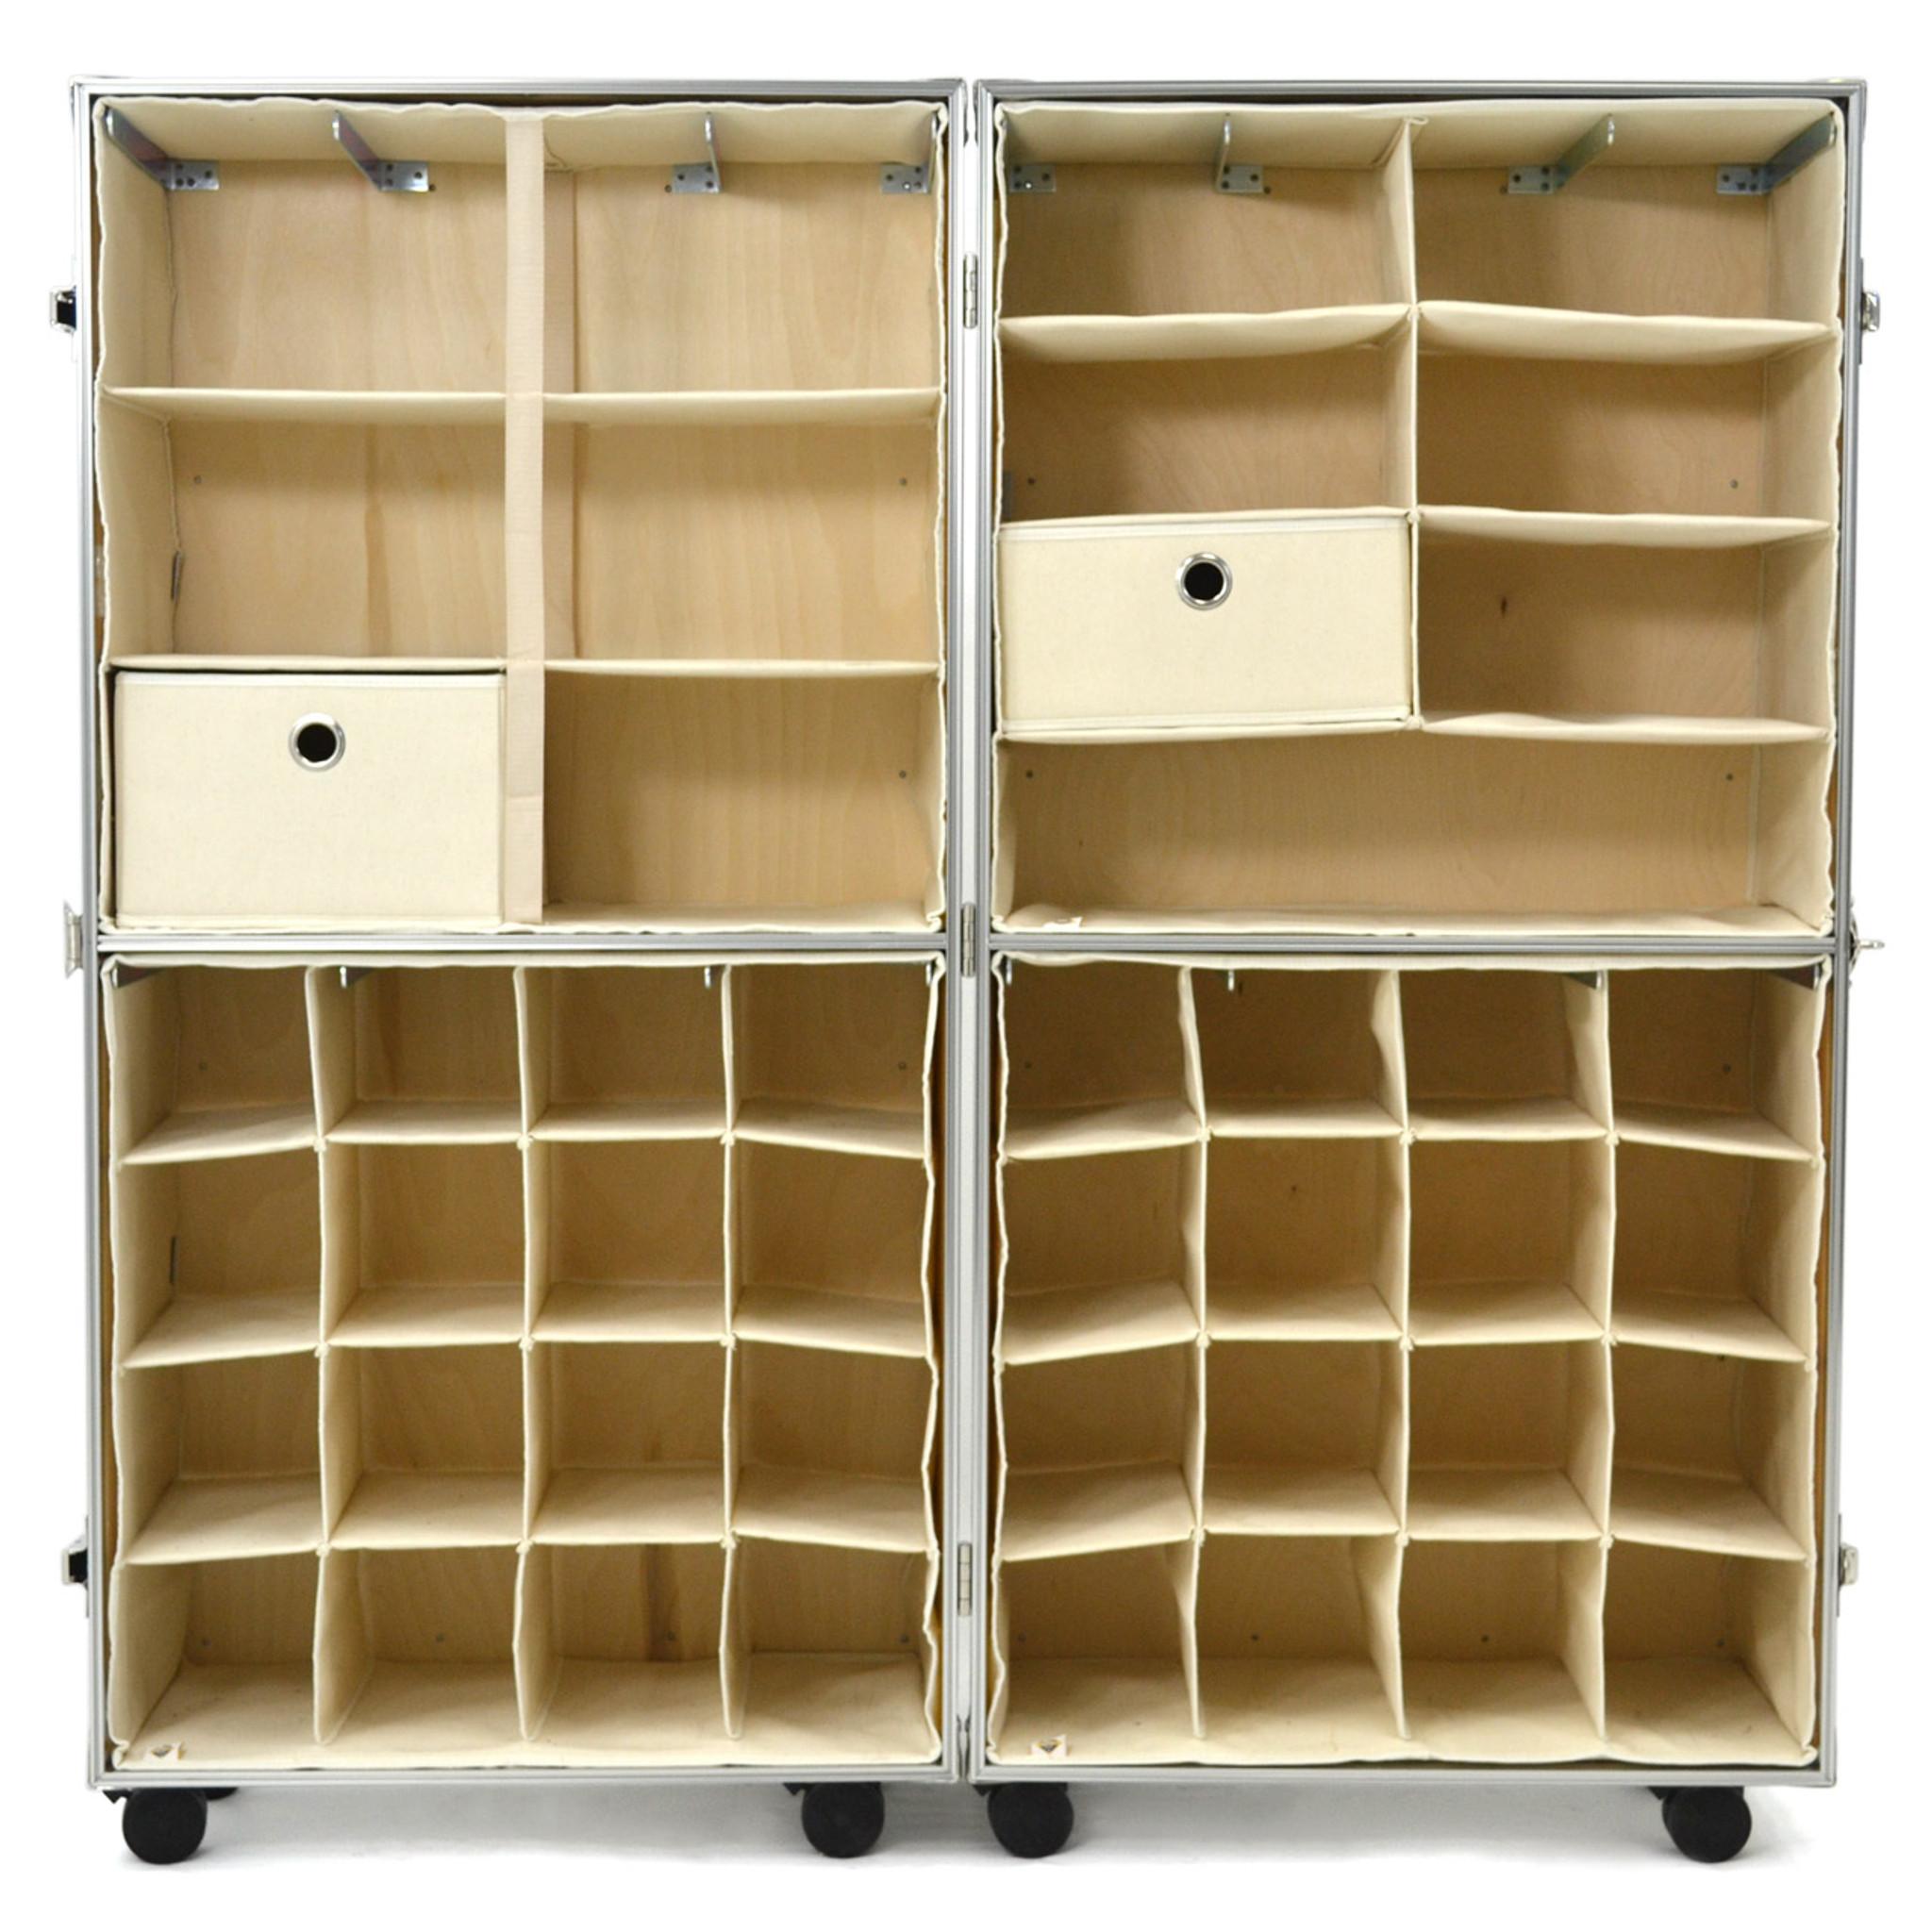 rhino urban wardrobe inserts three shelf insert top left four shelf insert - Wardrobe Trunk